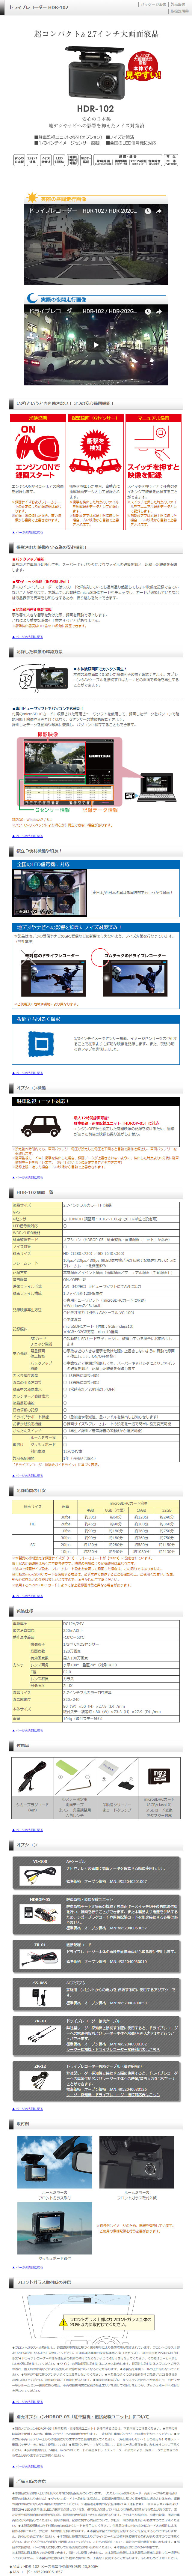 HDR-102_HP.jpg